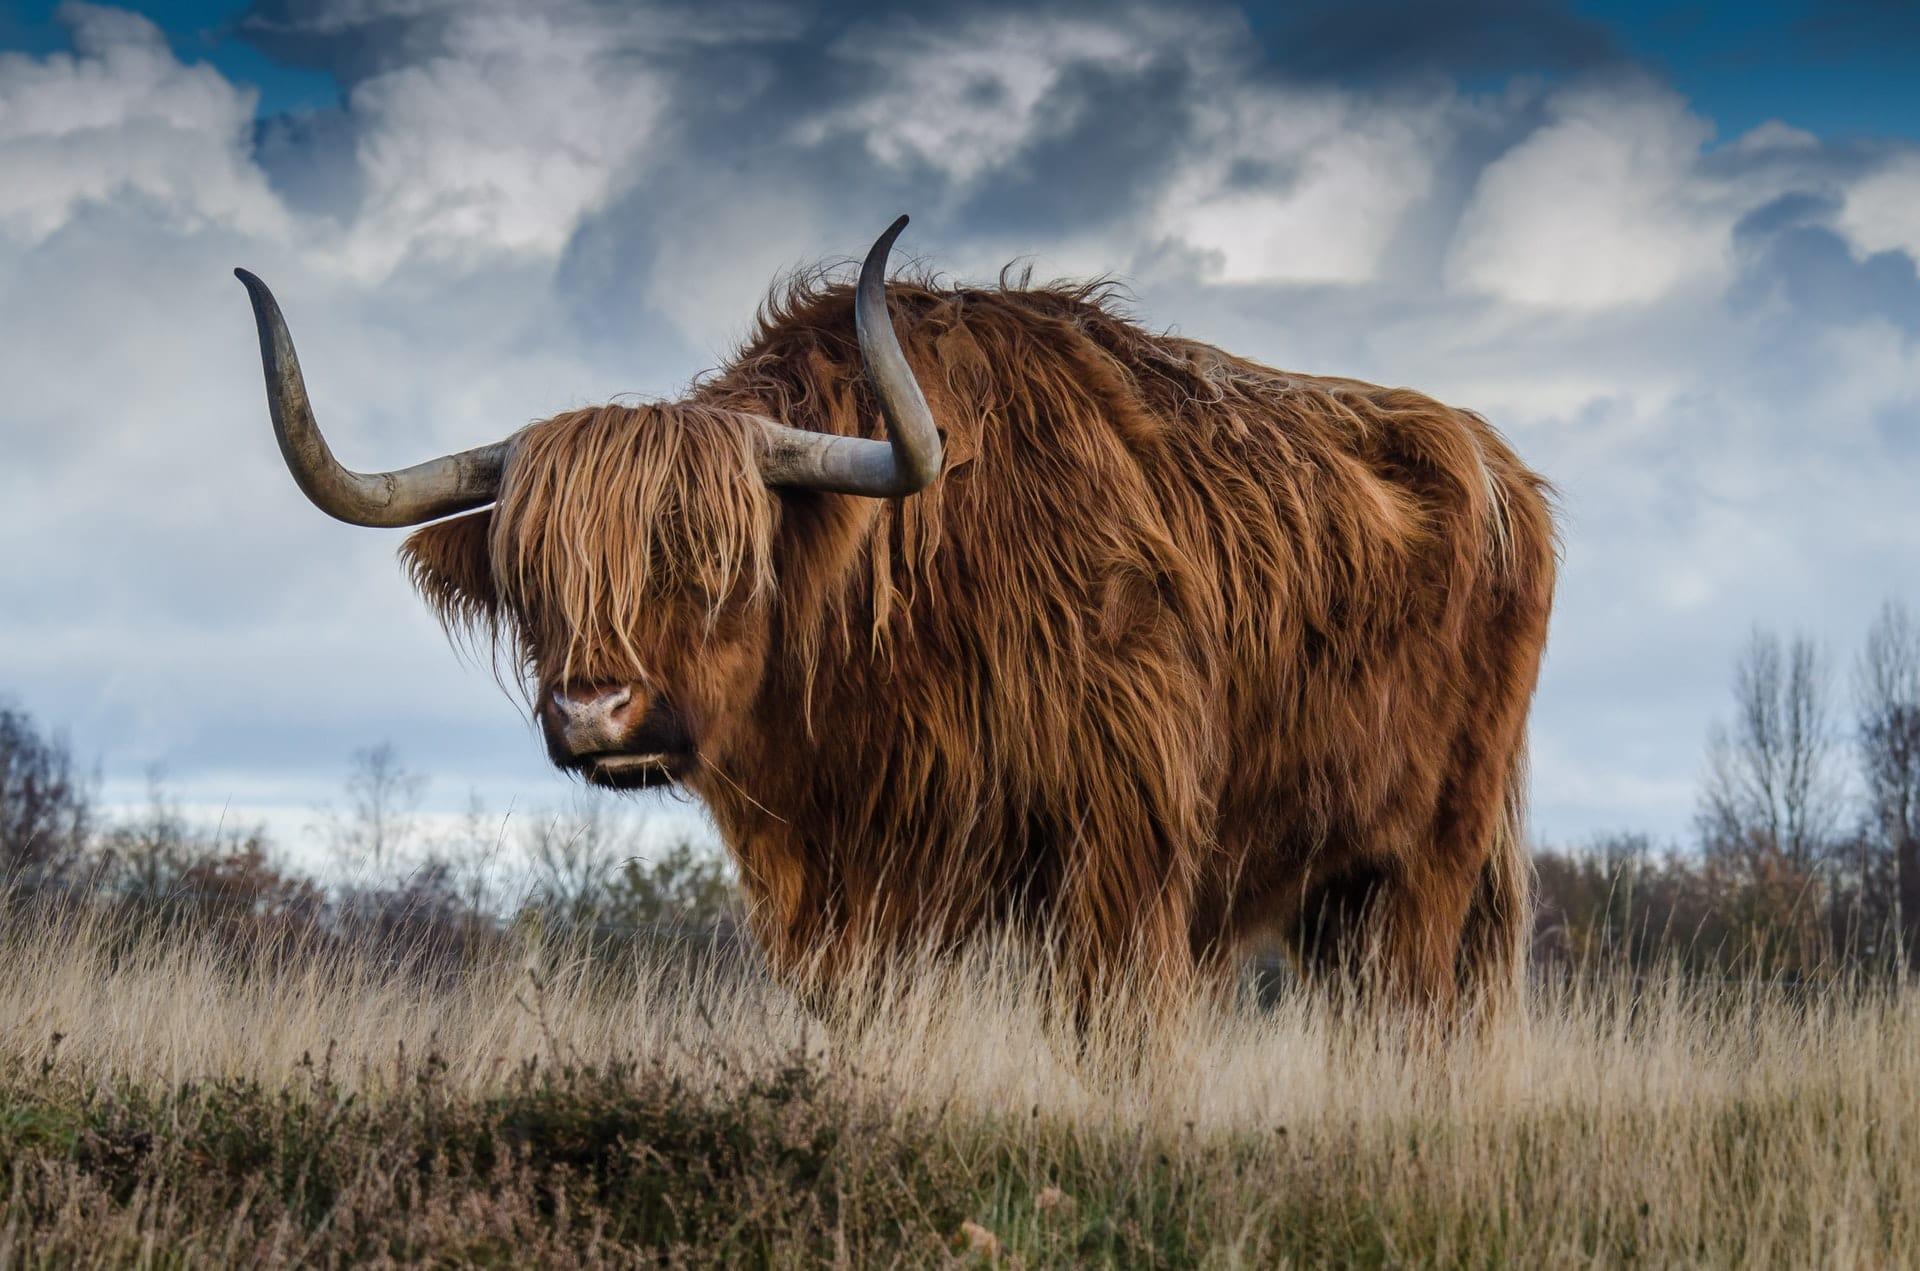 bull-landscape-nature-mammal-144234